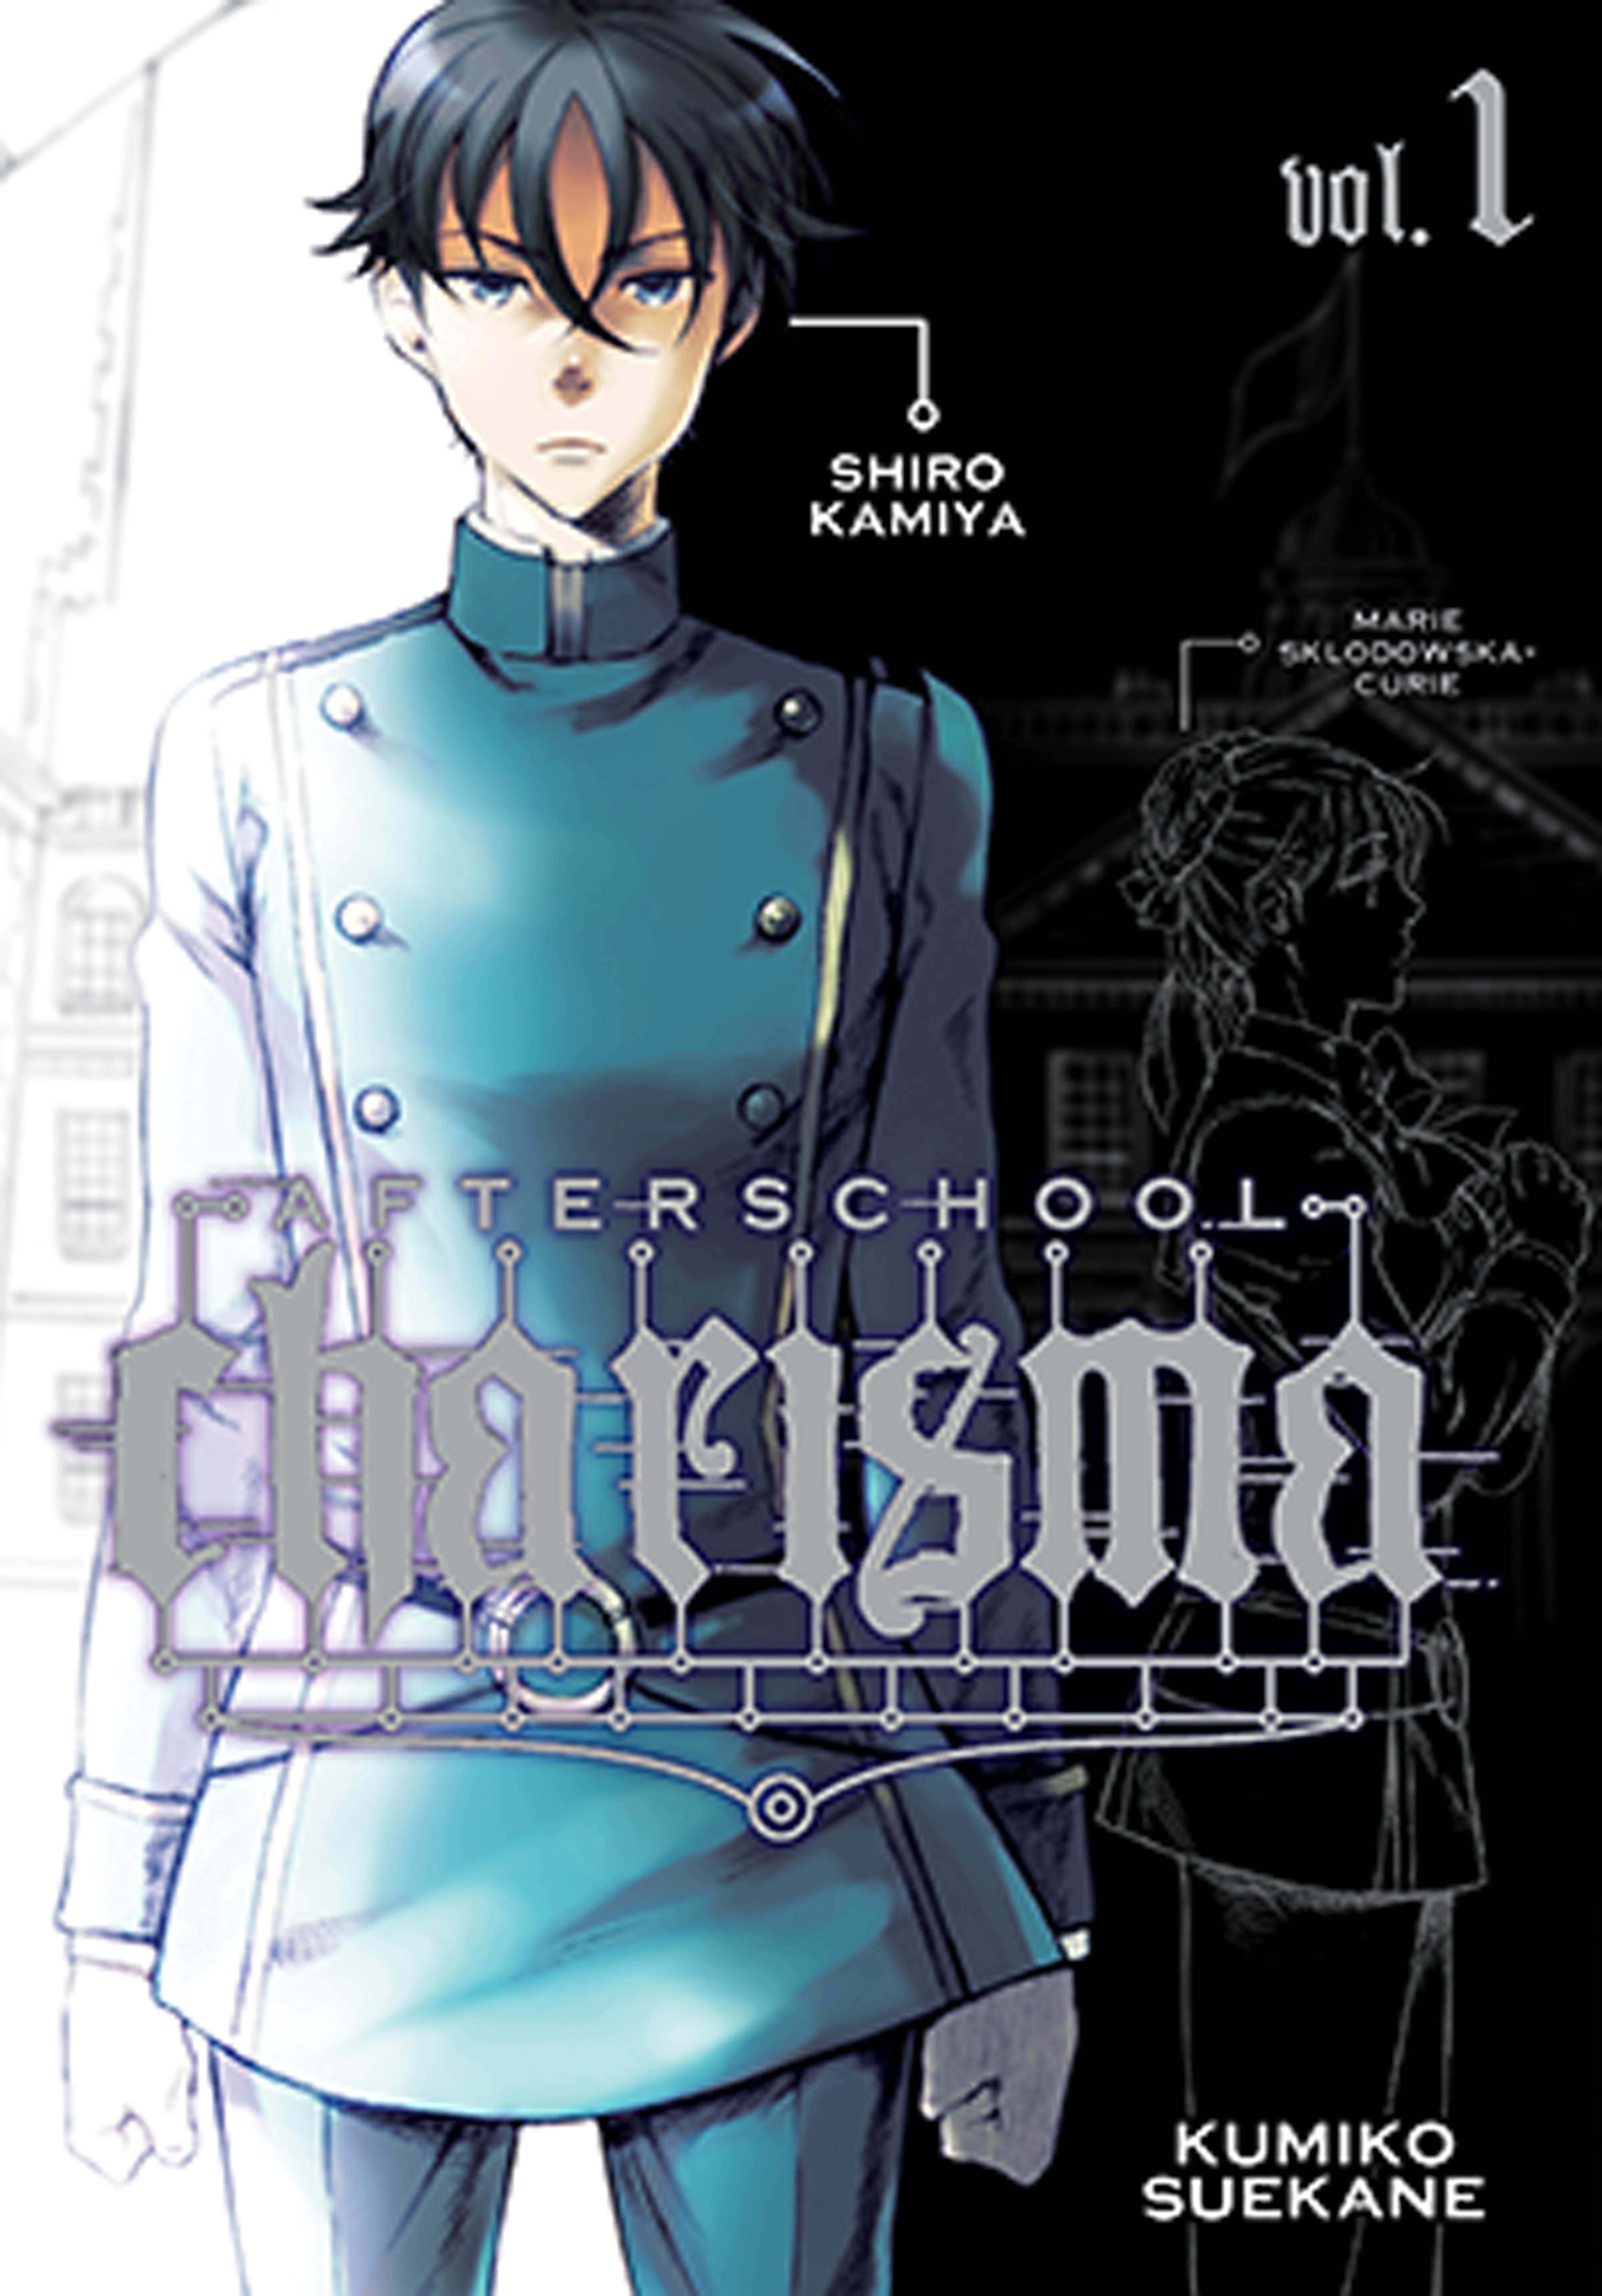 Afterschool charisma vol 1 manga